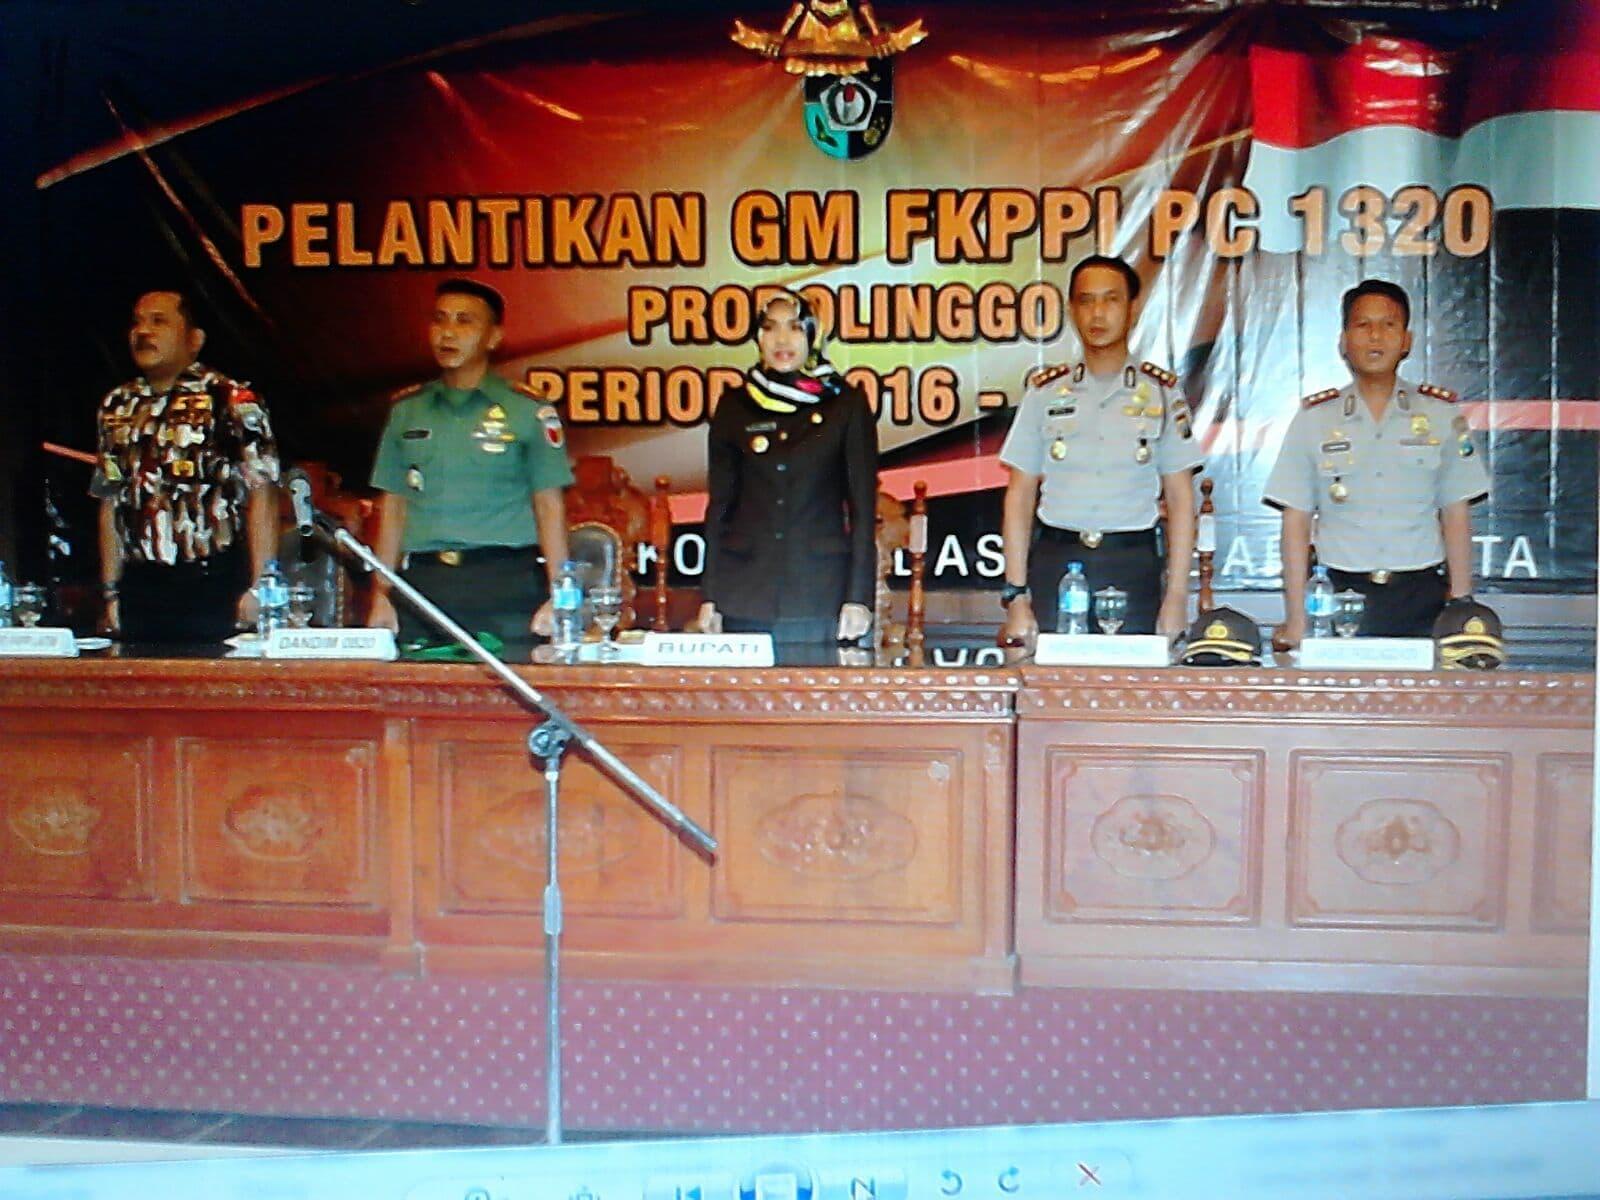 Dandim 0820 Hadiri Pelantikan Pengcab GM FKKPI 1320/Probolinggo